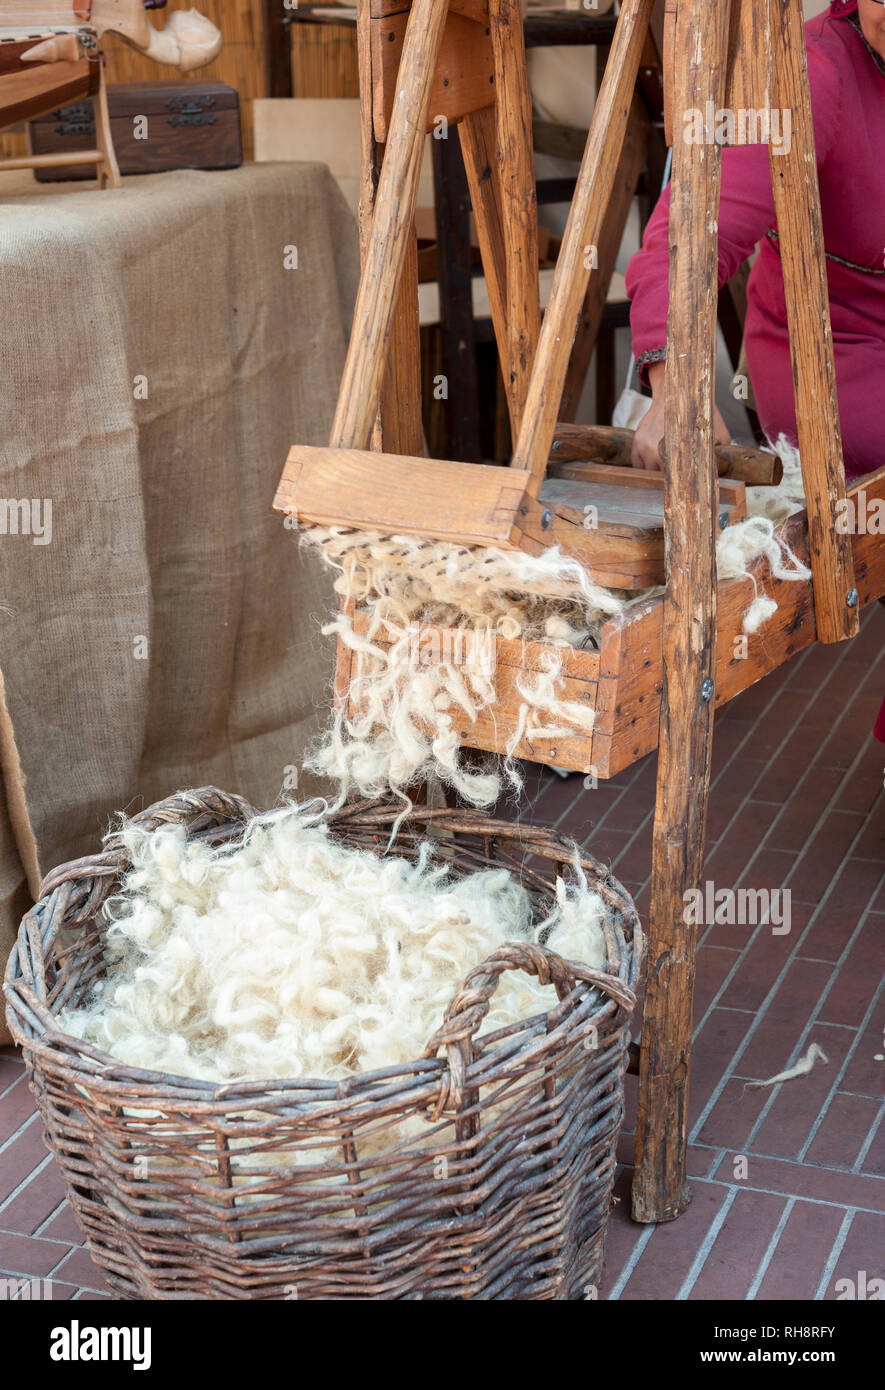 Carding Machine Wool Stock Photos & Carding Machine Wool Stock